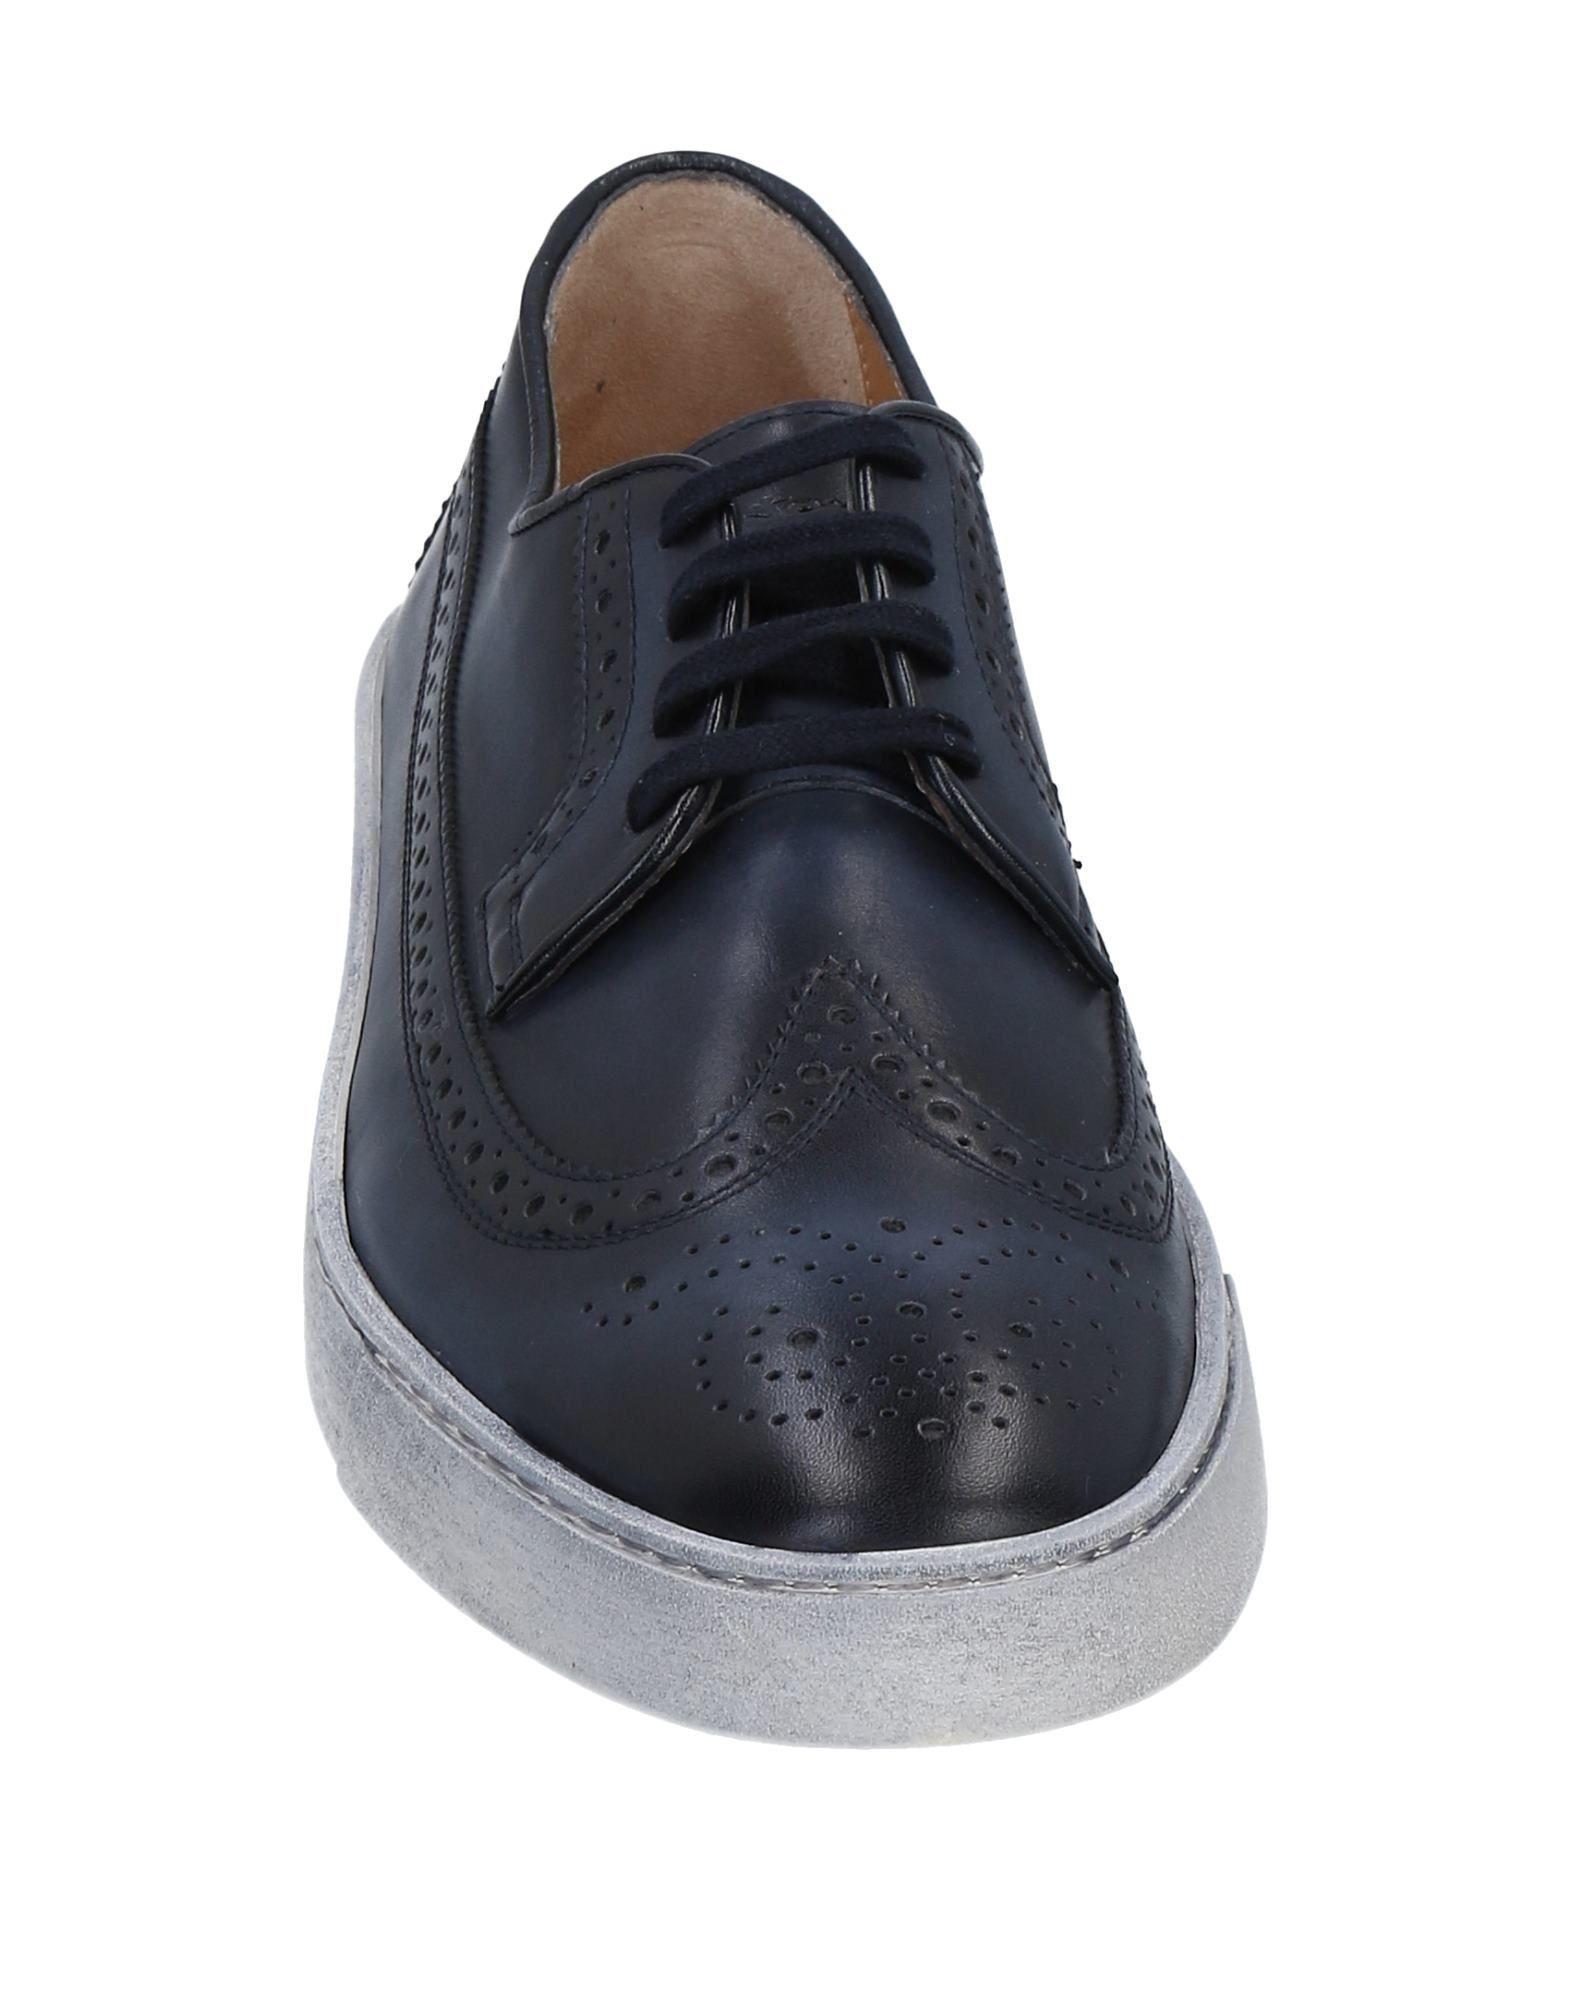 Santoni Leather Low-tops & Sneakers in Dark Blue (Blue) for Men